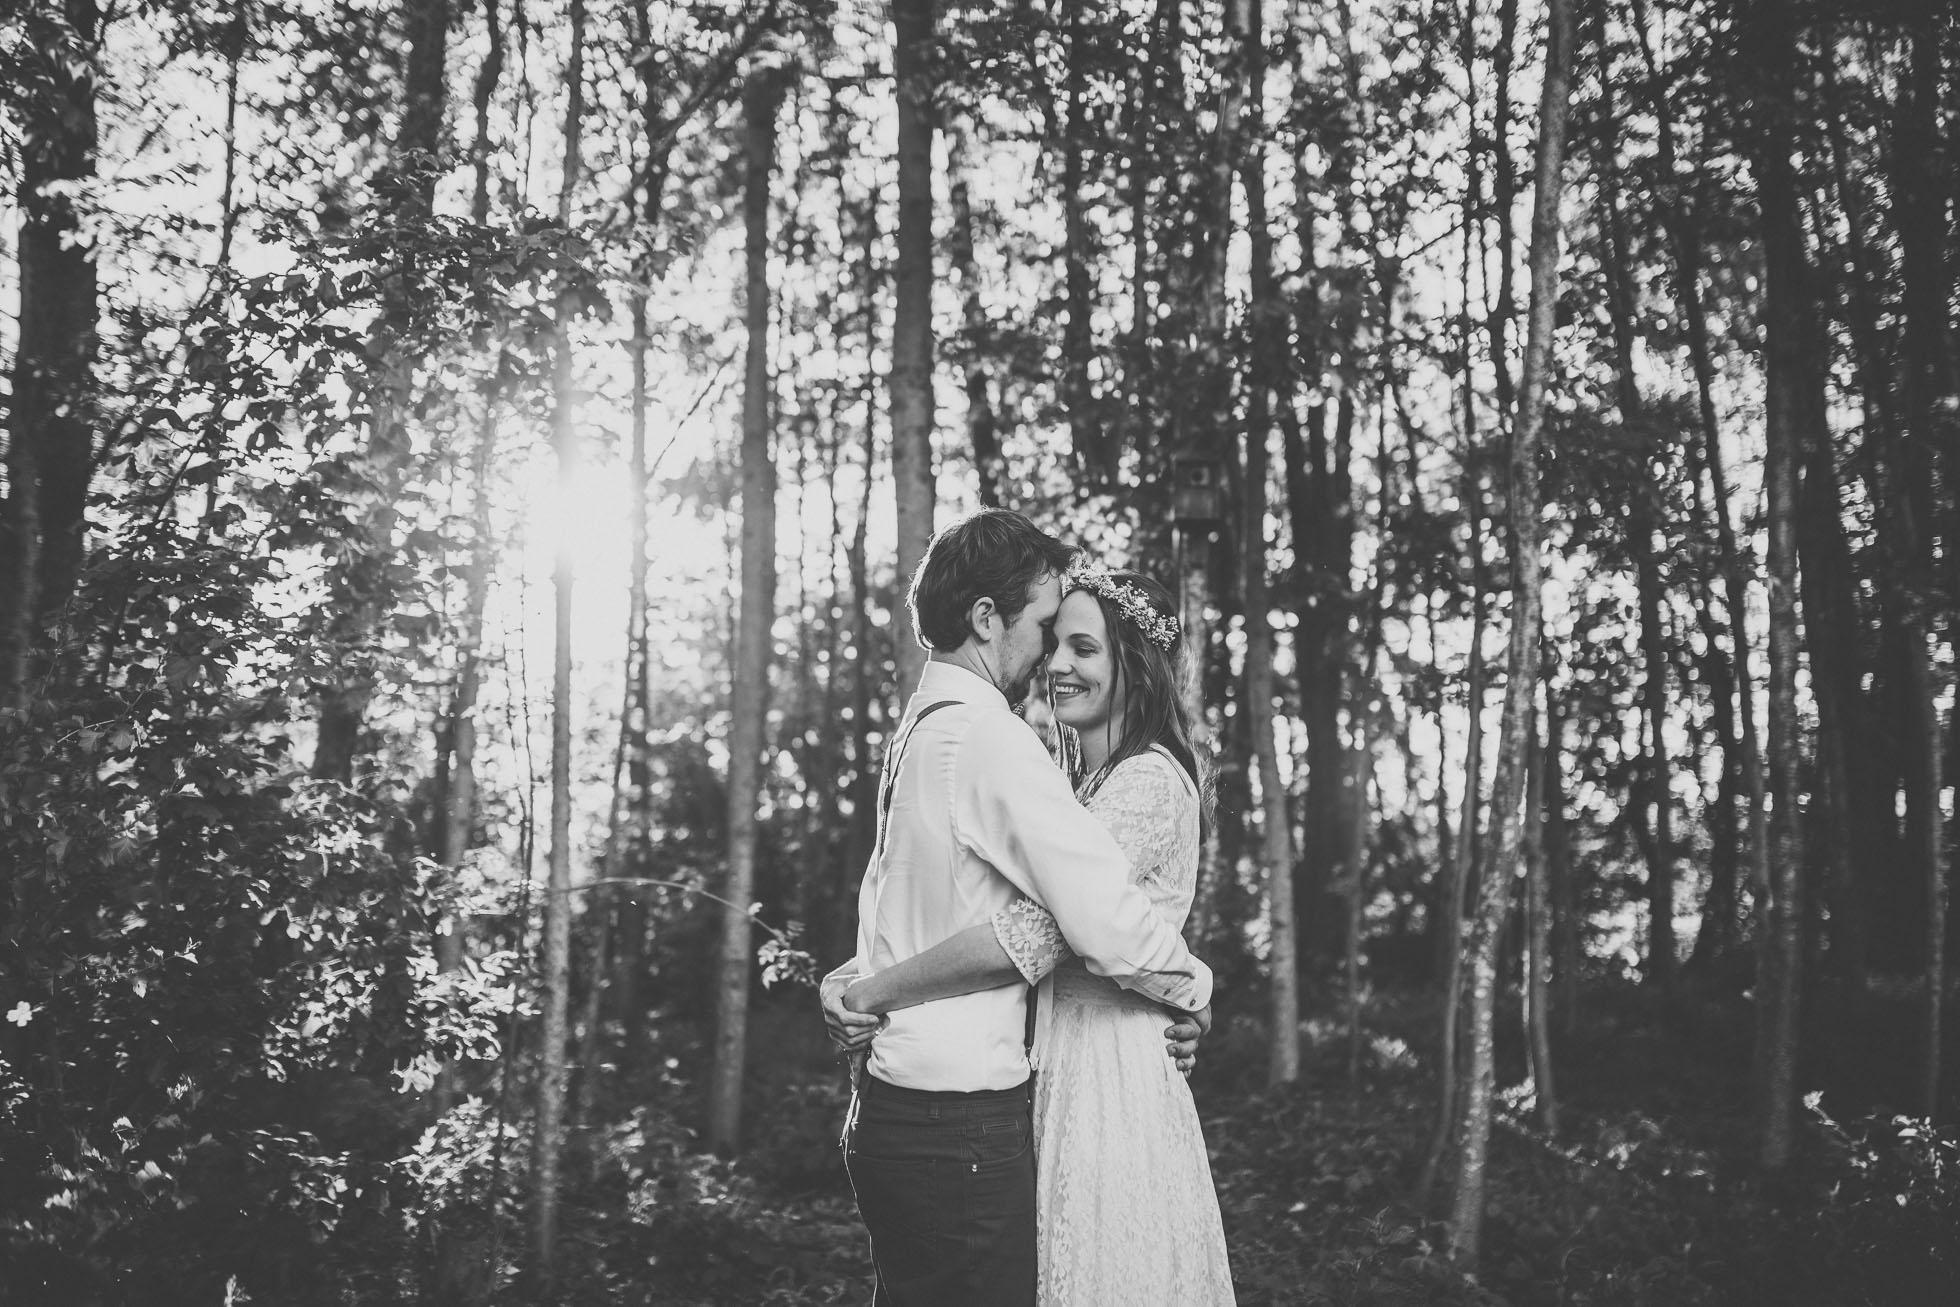 utrecht-wedding-photographer-127.jpg